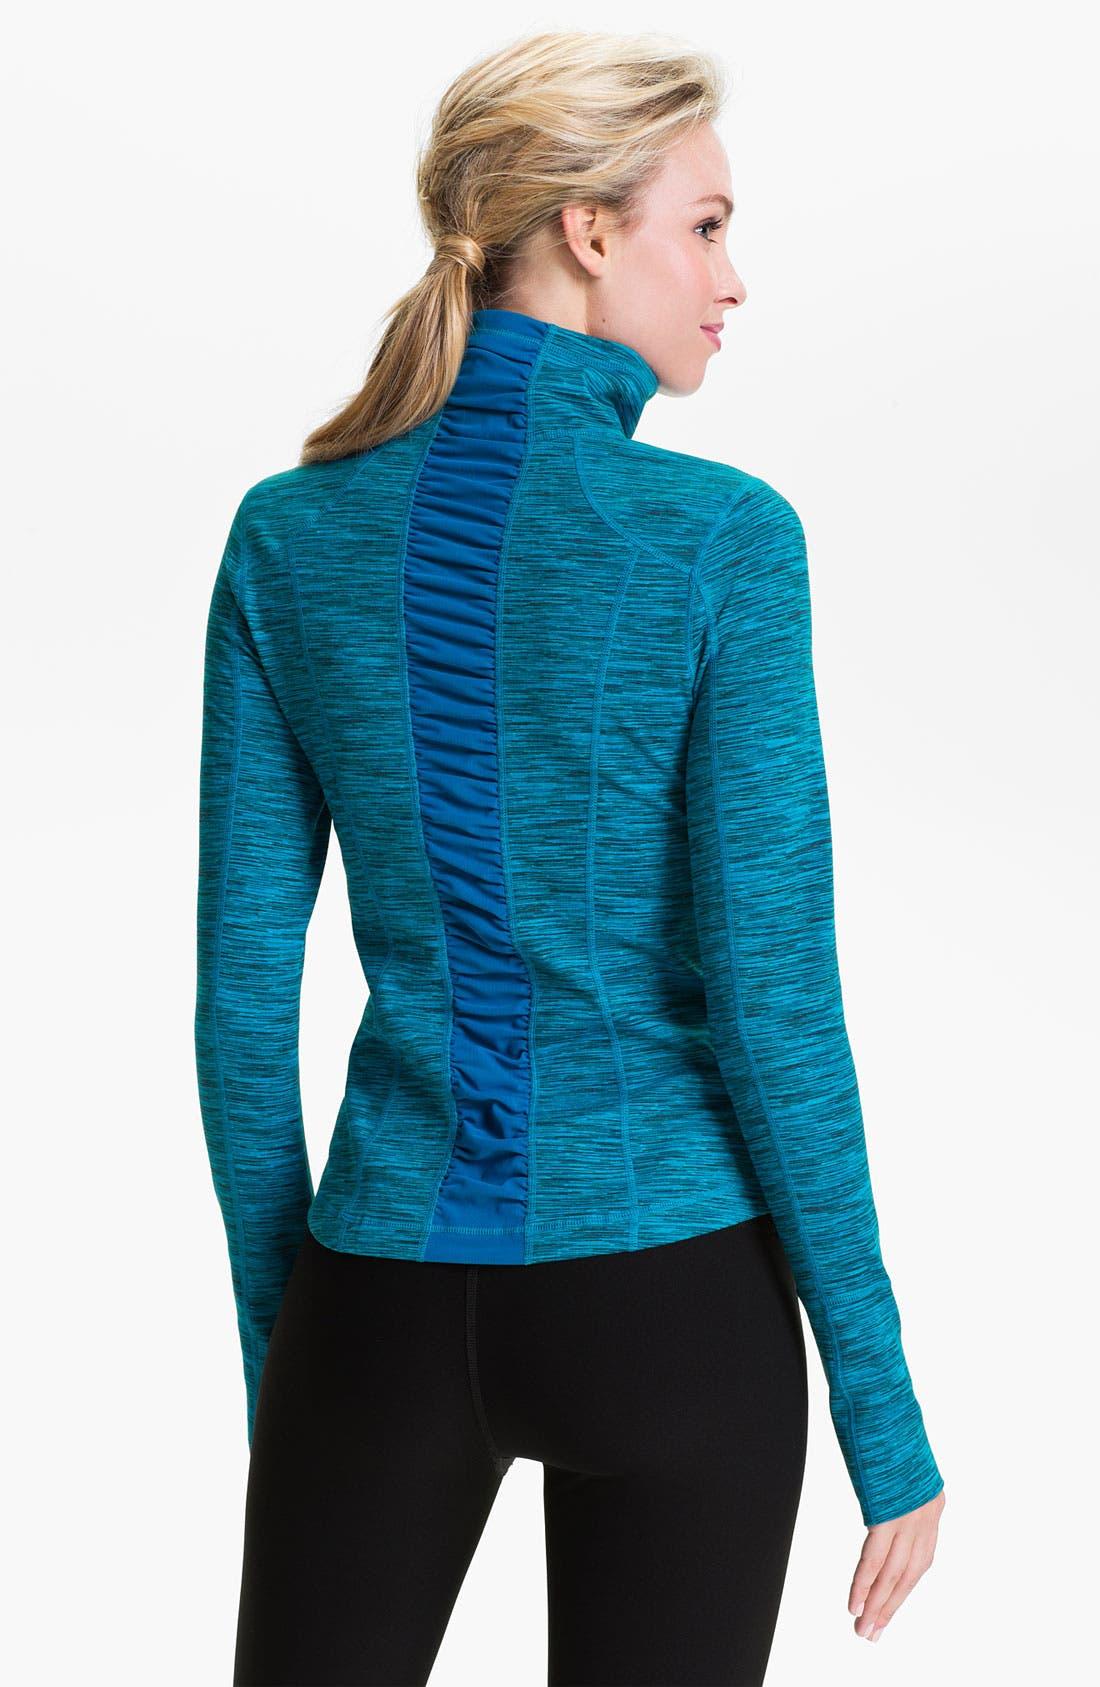 Main Image - Zella 'Sophia' Space Dye Jacket